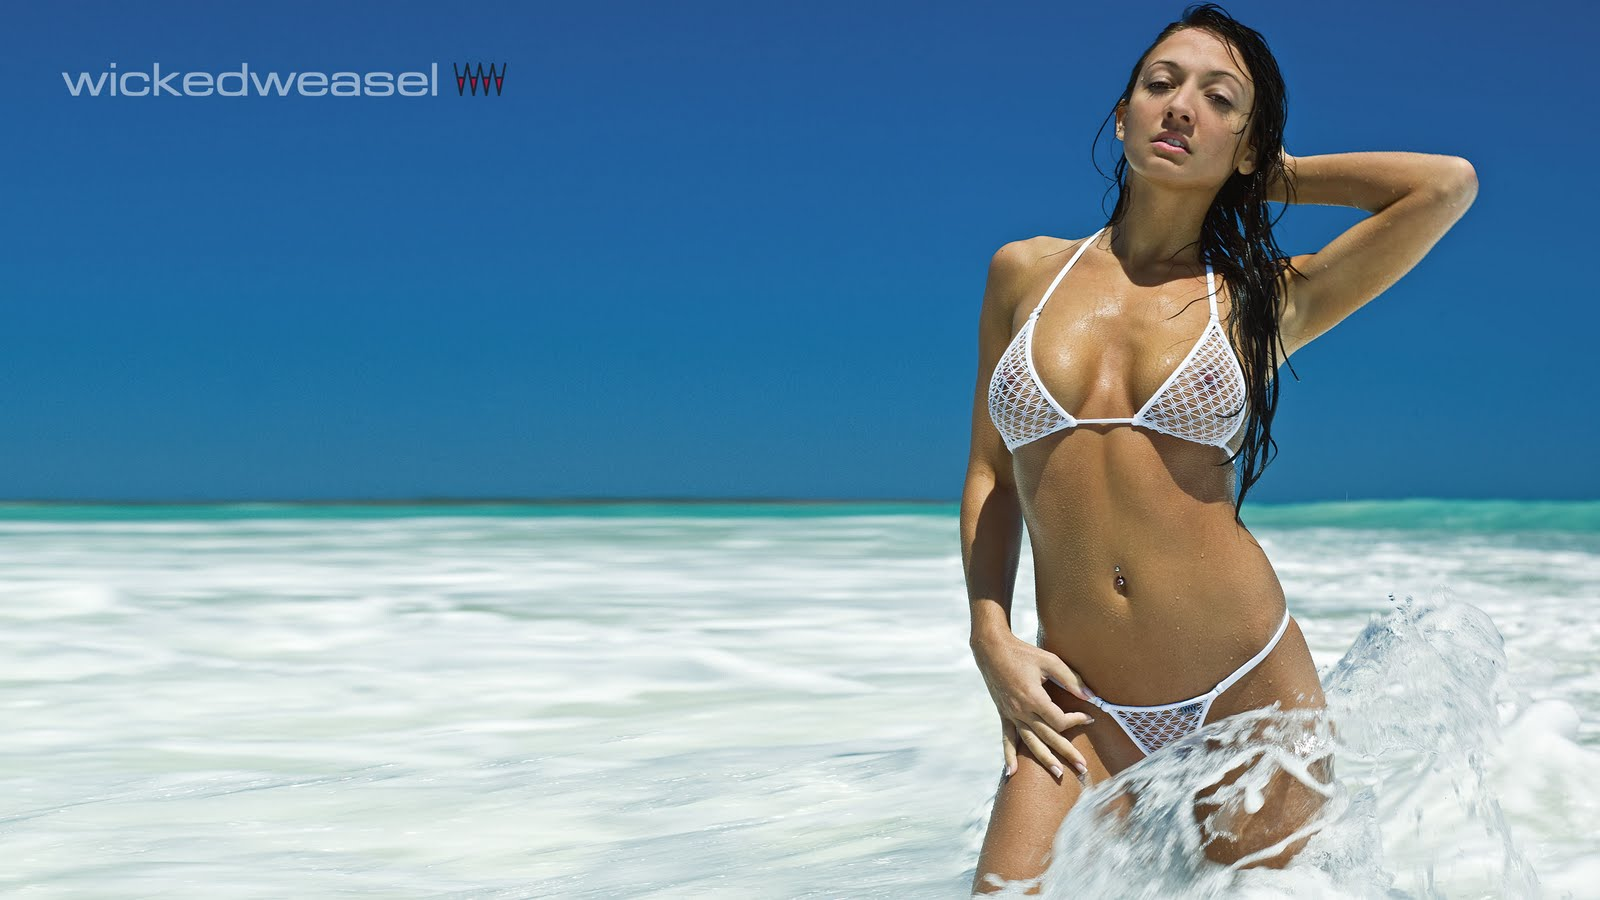 Sexy Sarah Bikini Beach Wallpaper